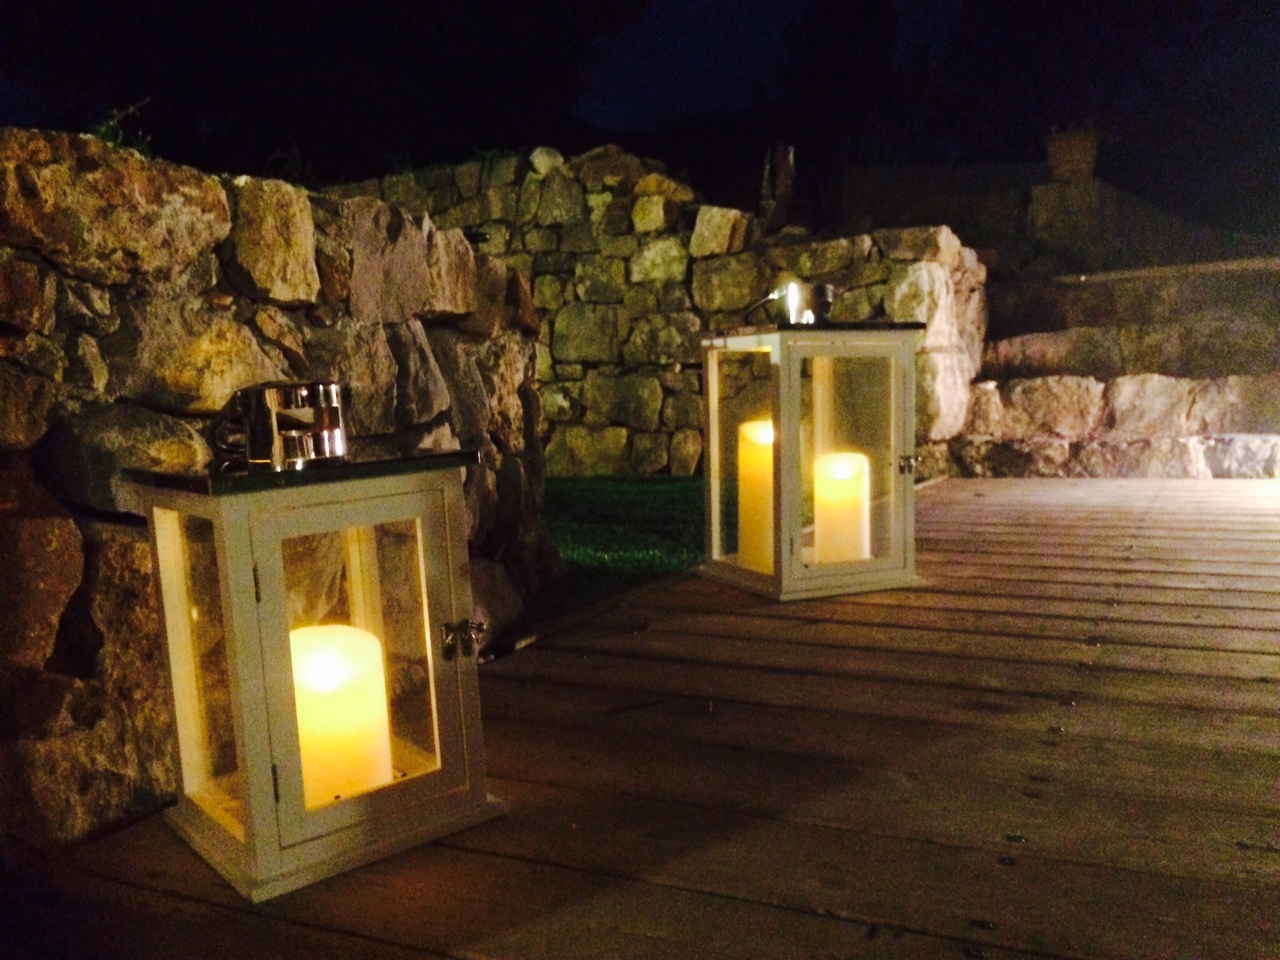 bougies led lumi re magie et d co mag des quinquas re belles. Black Bedroom Furniture Sets. Home Design Ideas